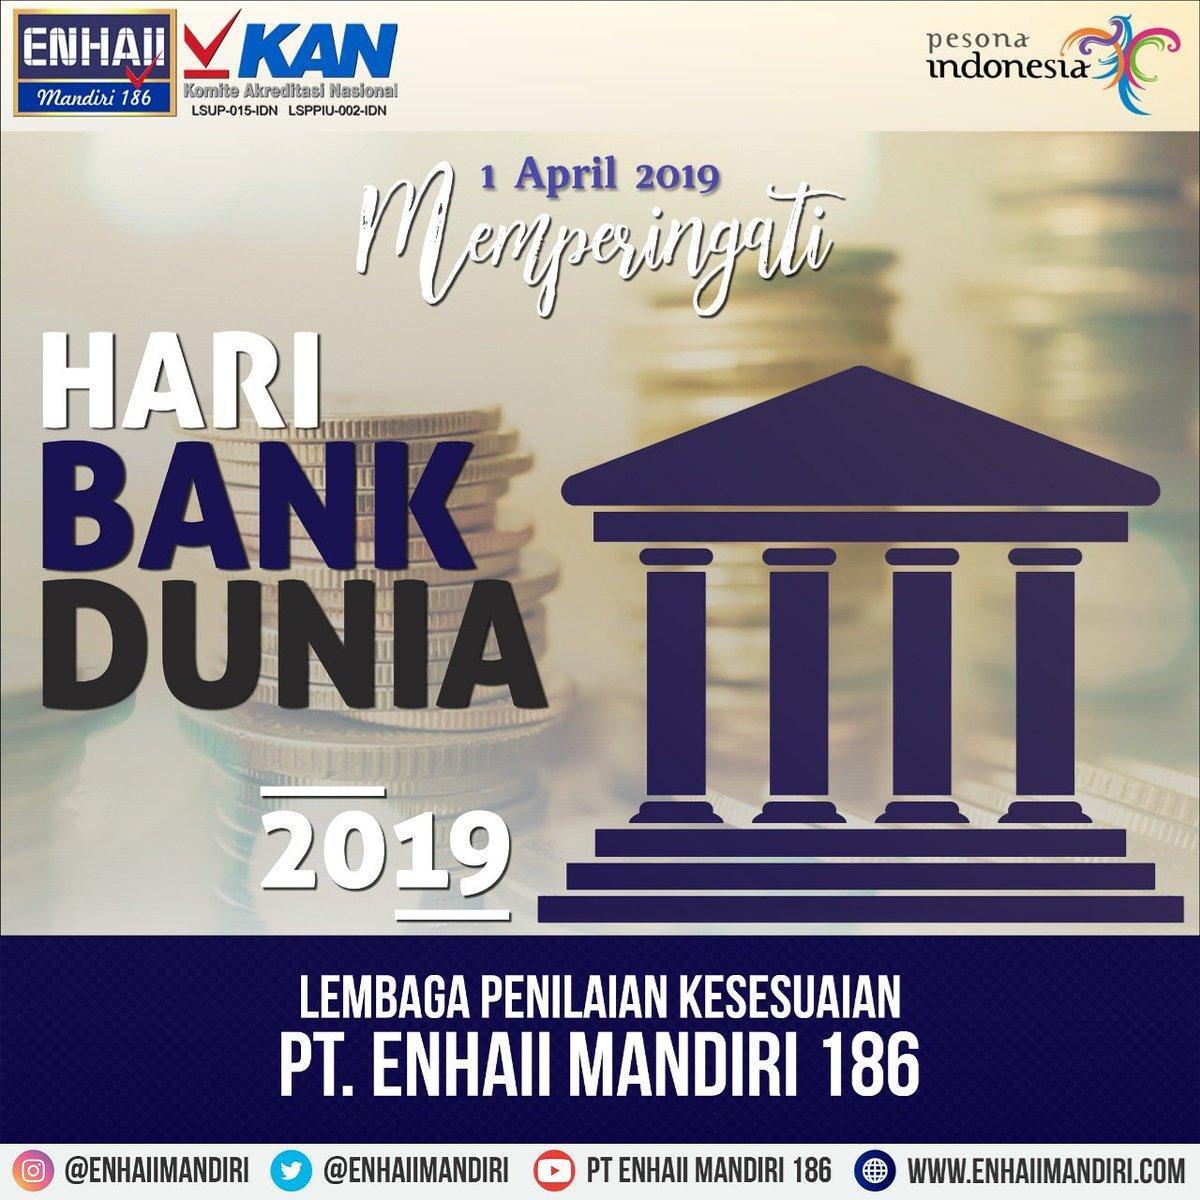 LPK PT. ENHAII MANDIRI 186 mengucapkan Selamat Hari Bank Indonesia.  Semoga perbankan Nasional semakin maju dan kokoh.  Tetaplah membangun Negara ini agar menjadi lebih baik. #haribankindonesia #lpk #enhaiimandiri186 #kan